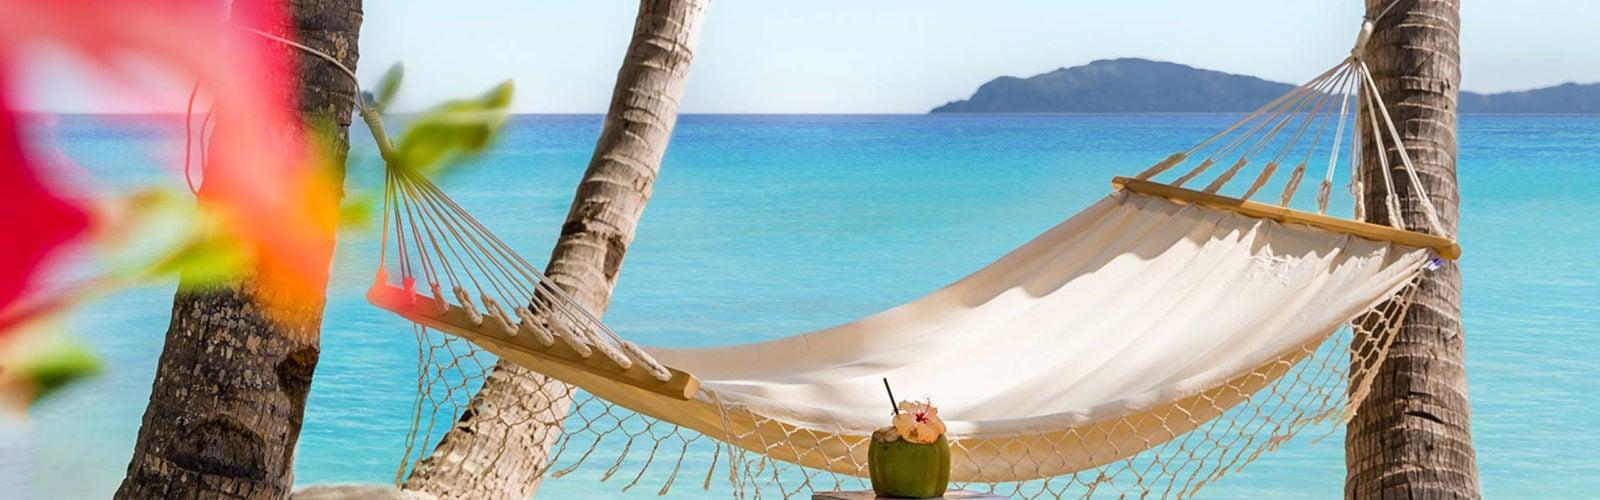 kokomo-private-island-hammock-1